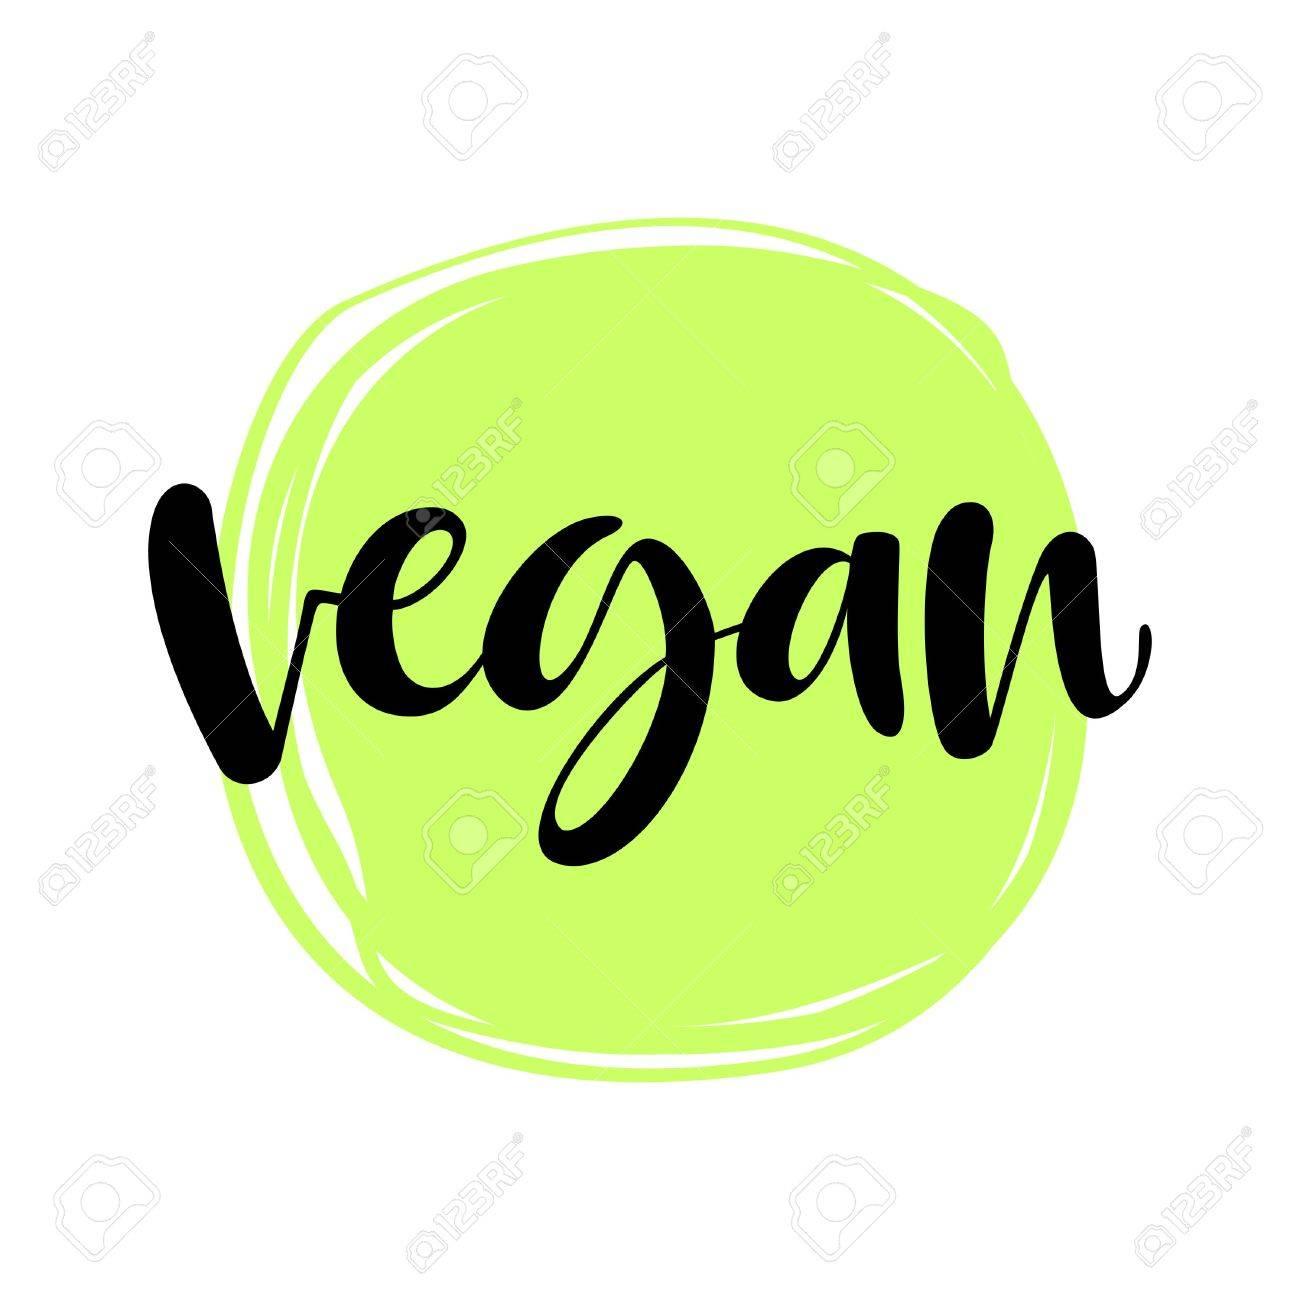 vector eco organic bio logos healthy food royalty free cliparts rh 123rf com health logistics products healthy logistics